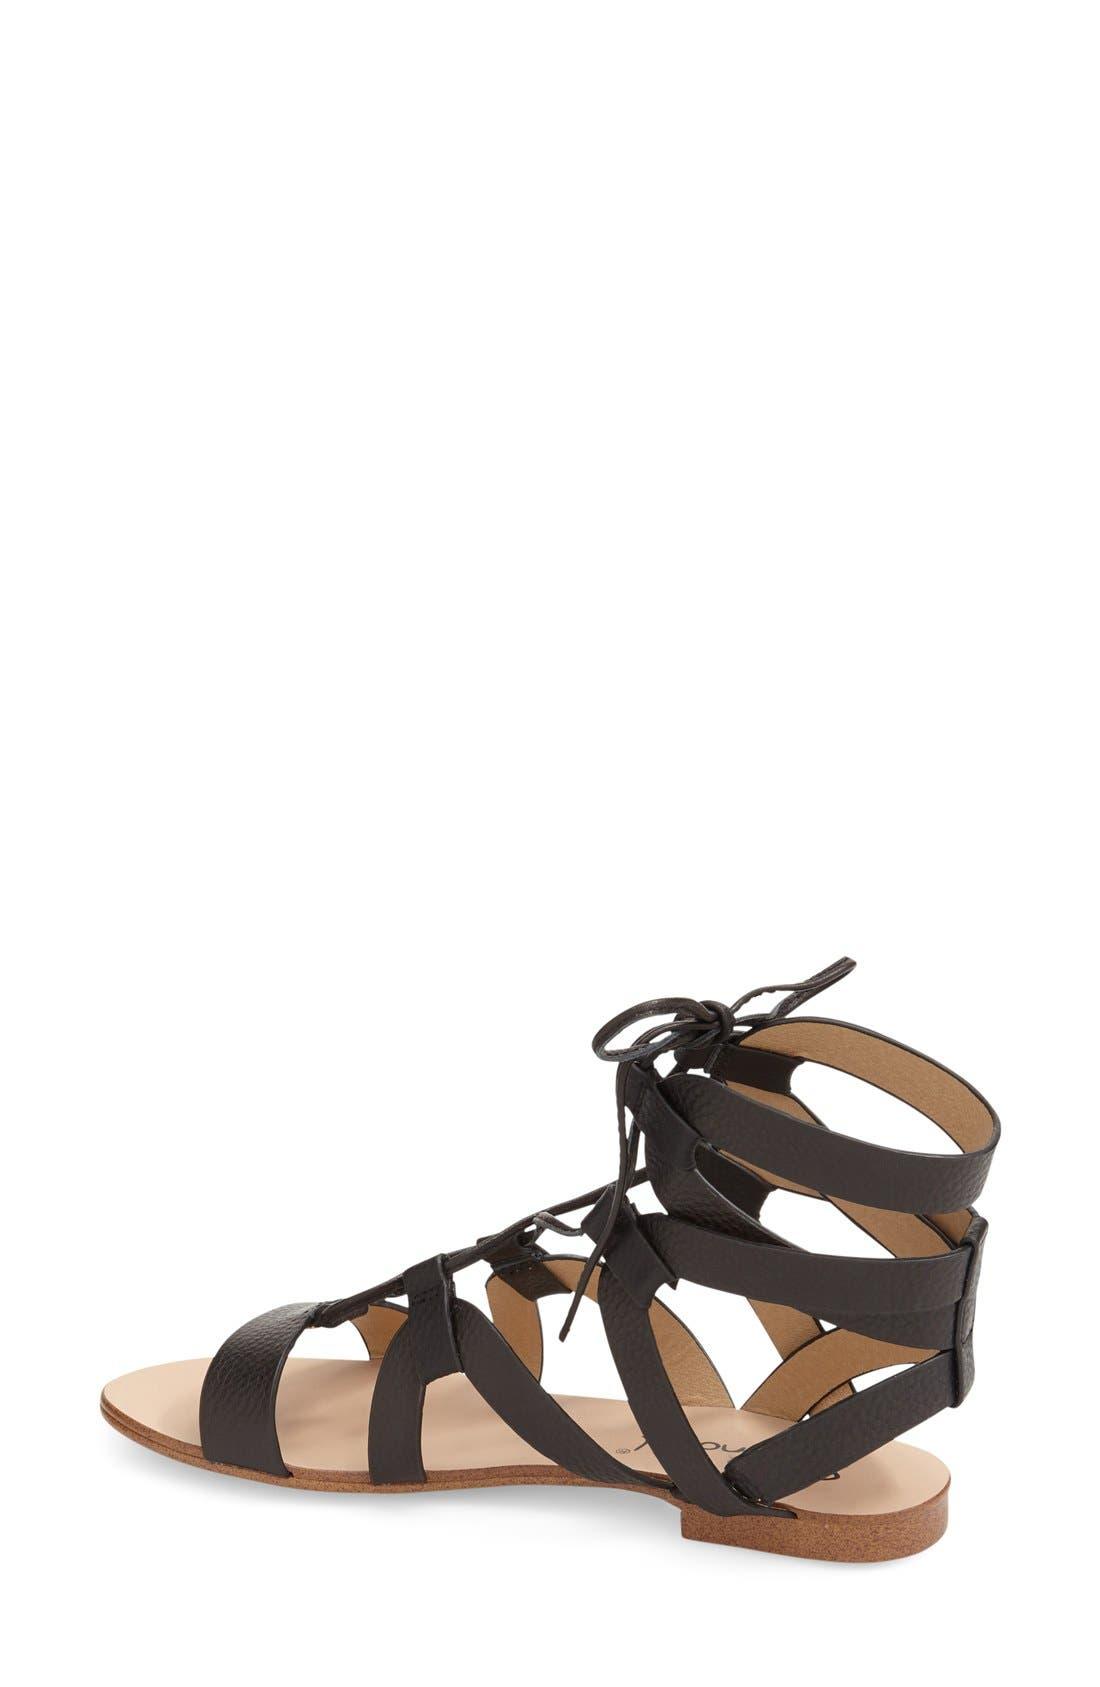 SPLENDID, 'Cameron' Lace-Up Sandal, Alternate thumbnail 3, color, 001